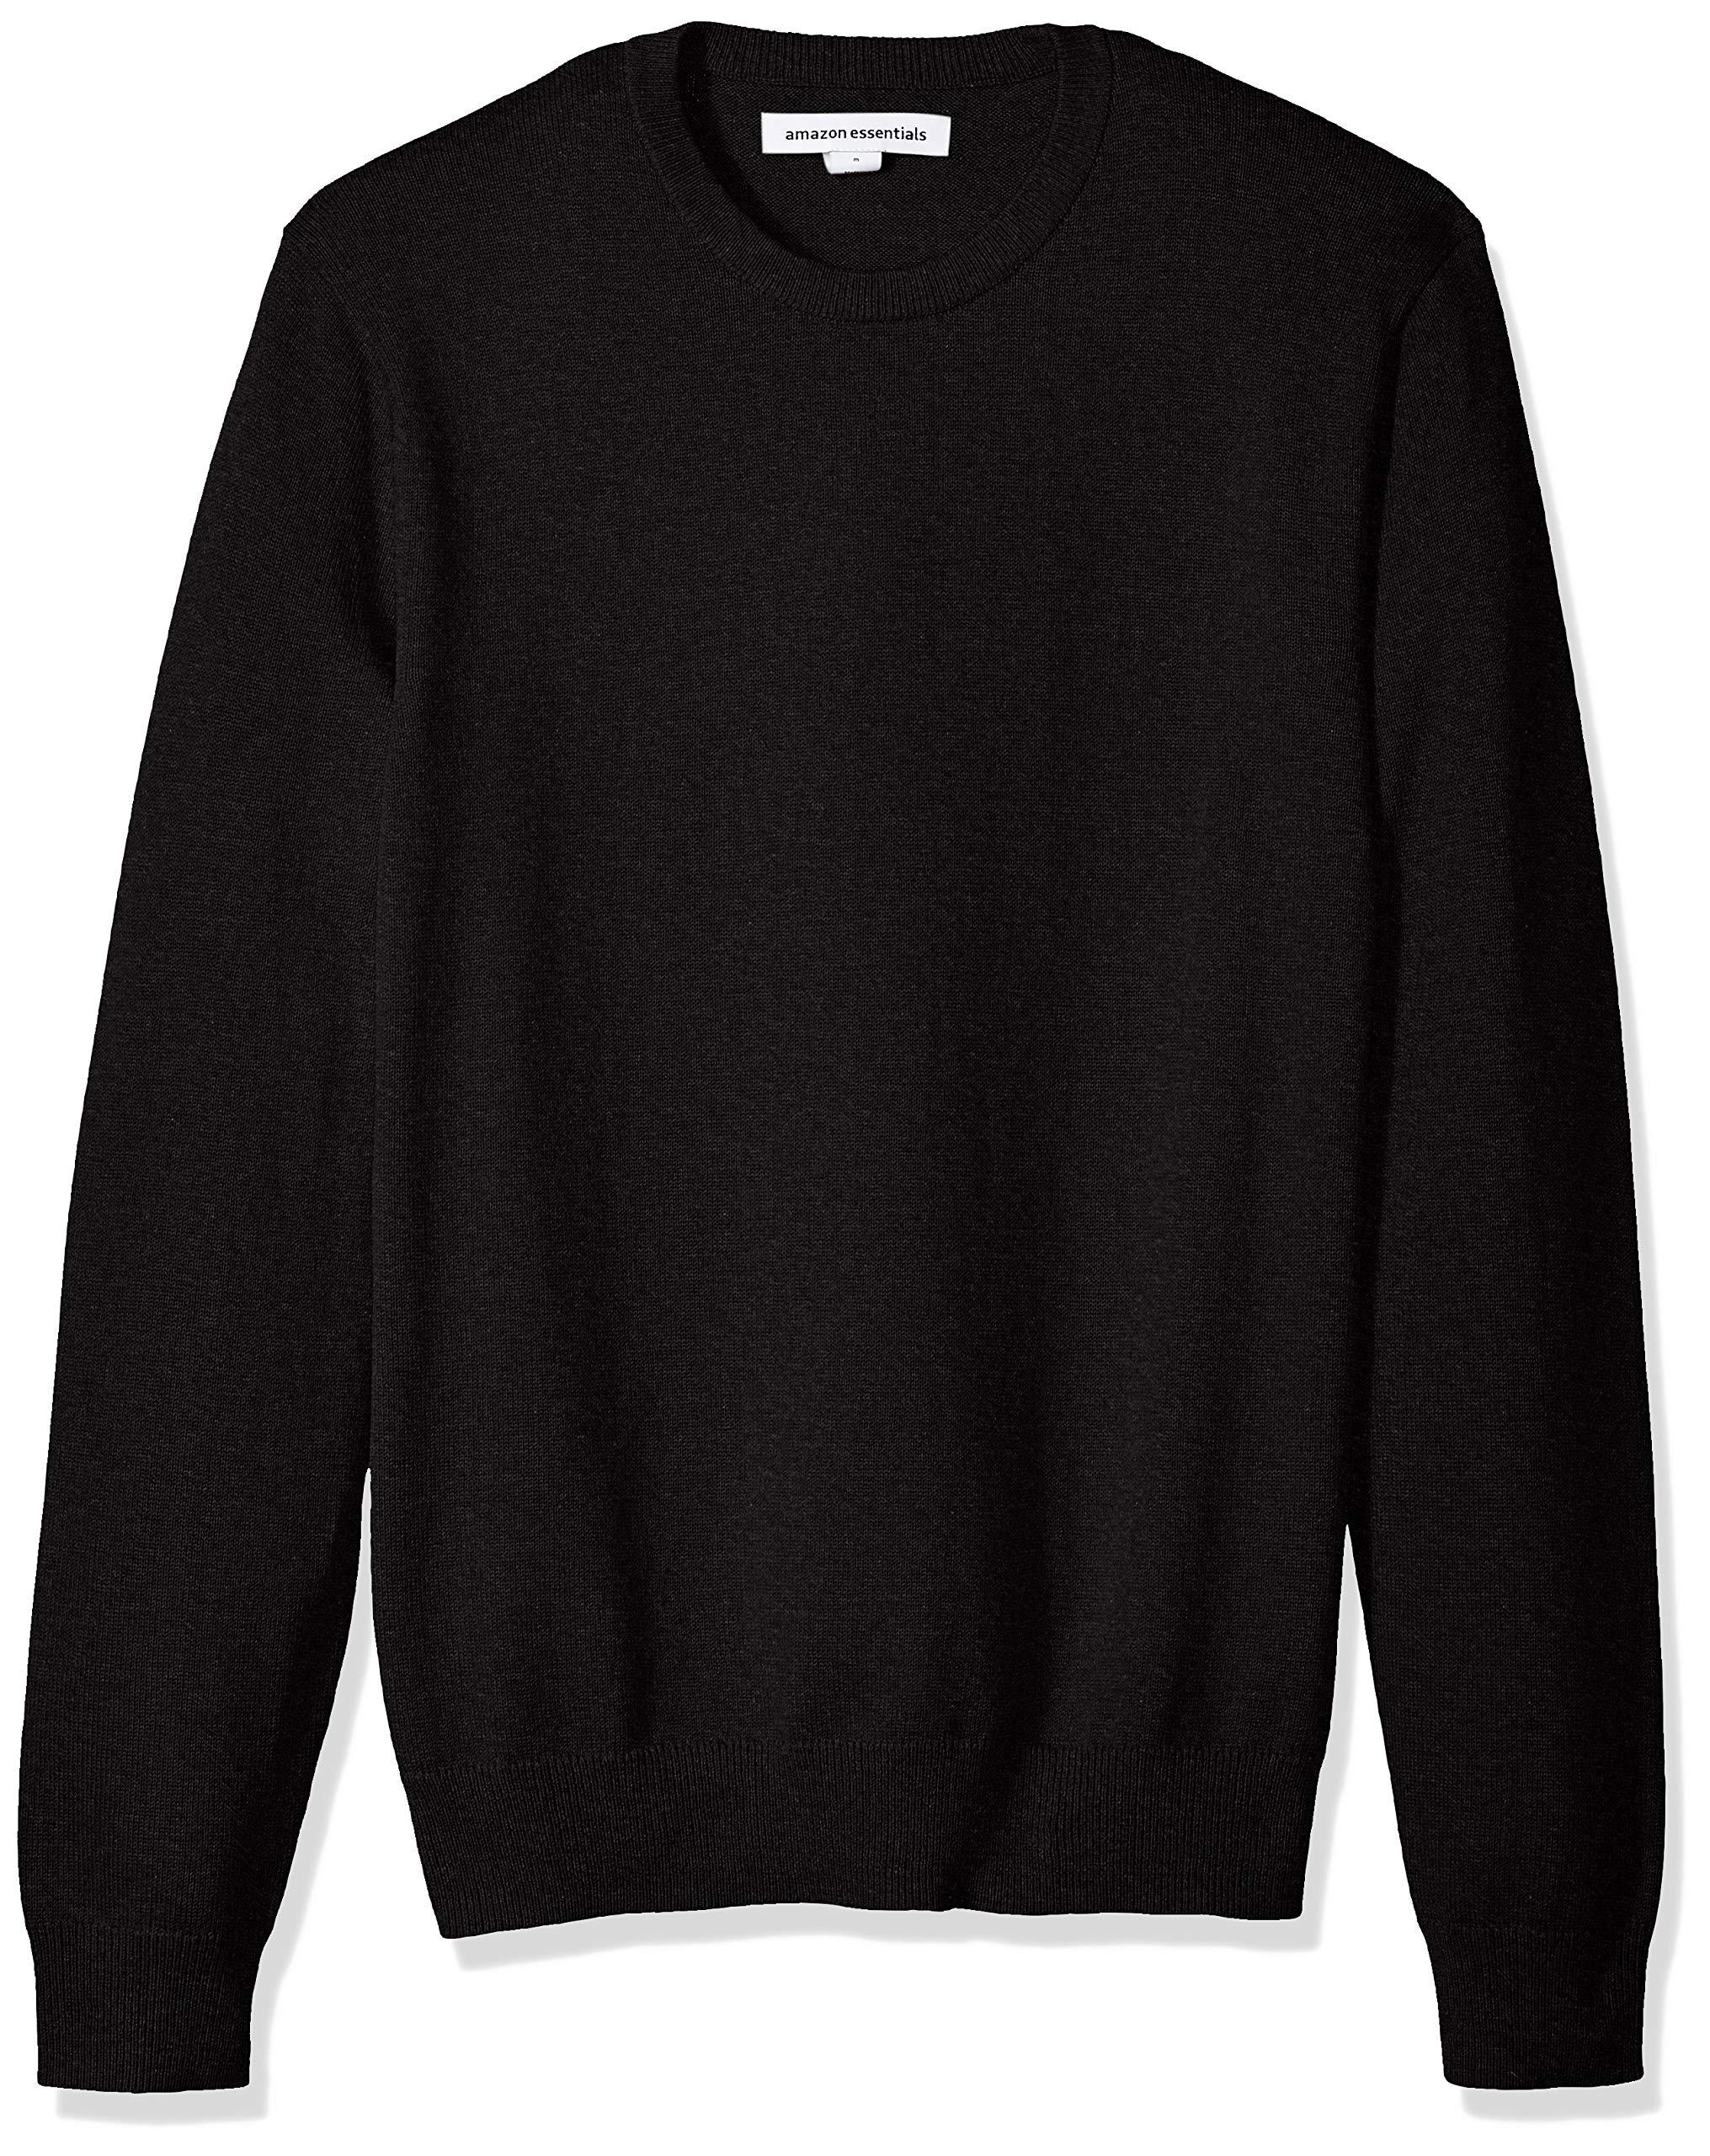 Amazon Essentials Men's Standard Crewneck Sweater, Black, X-Large